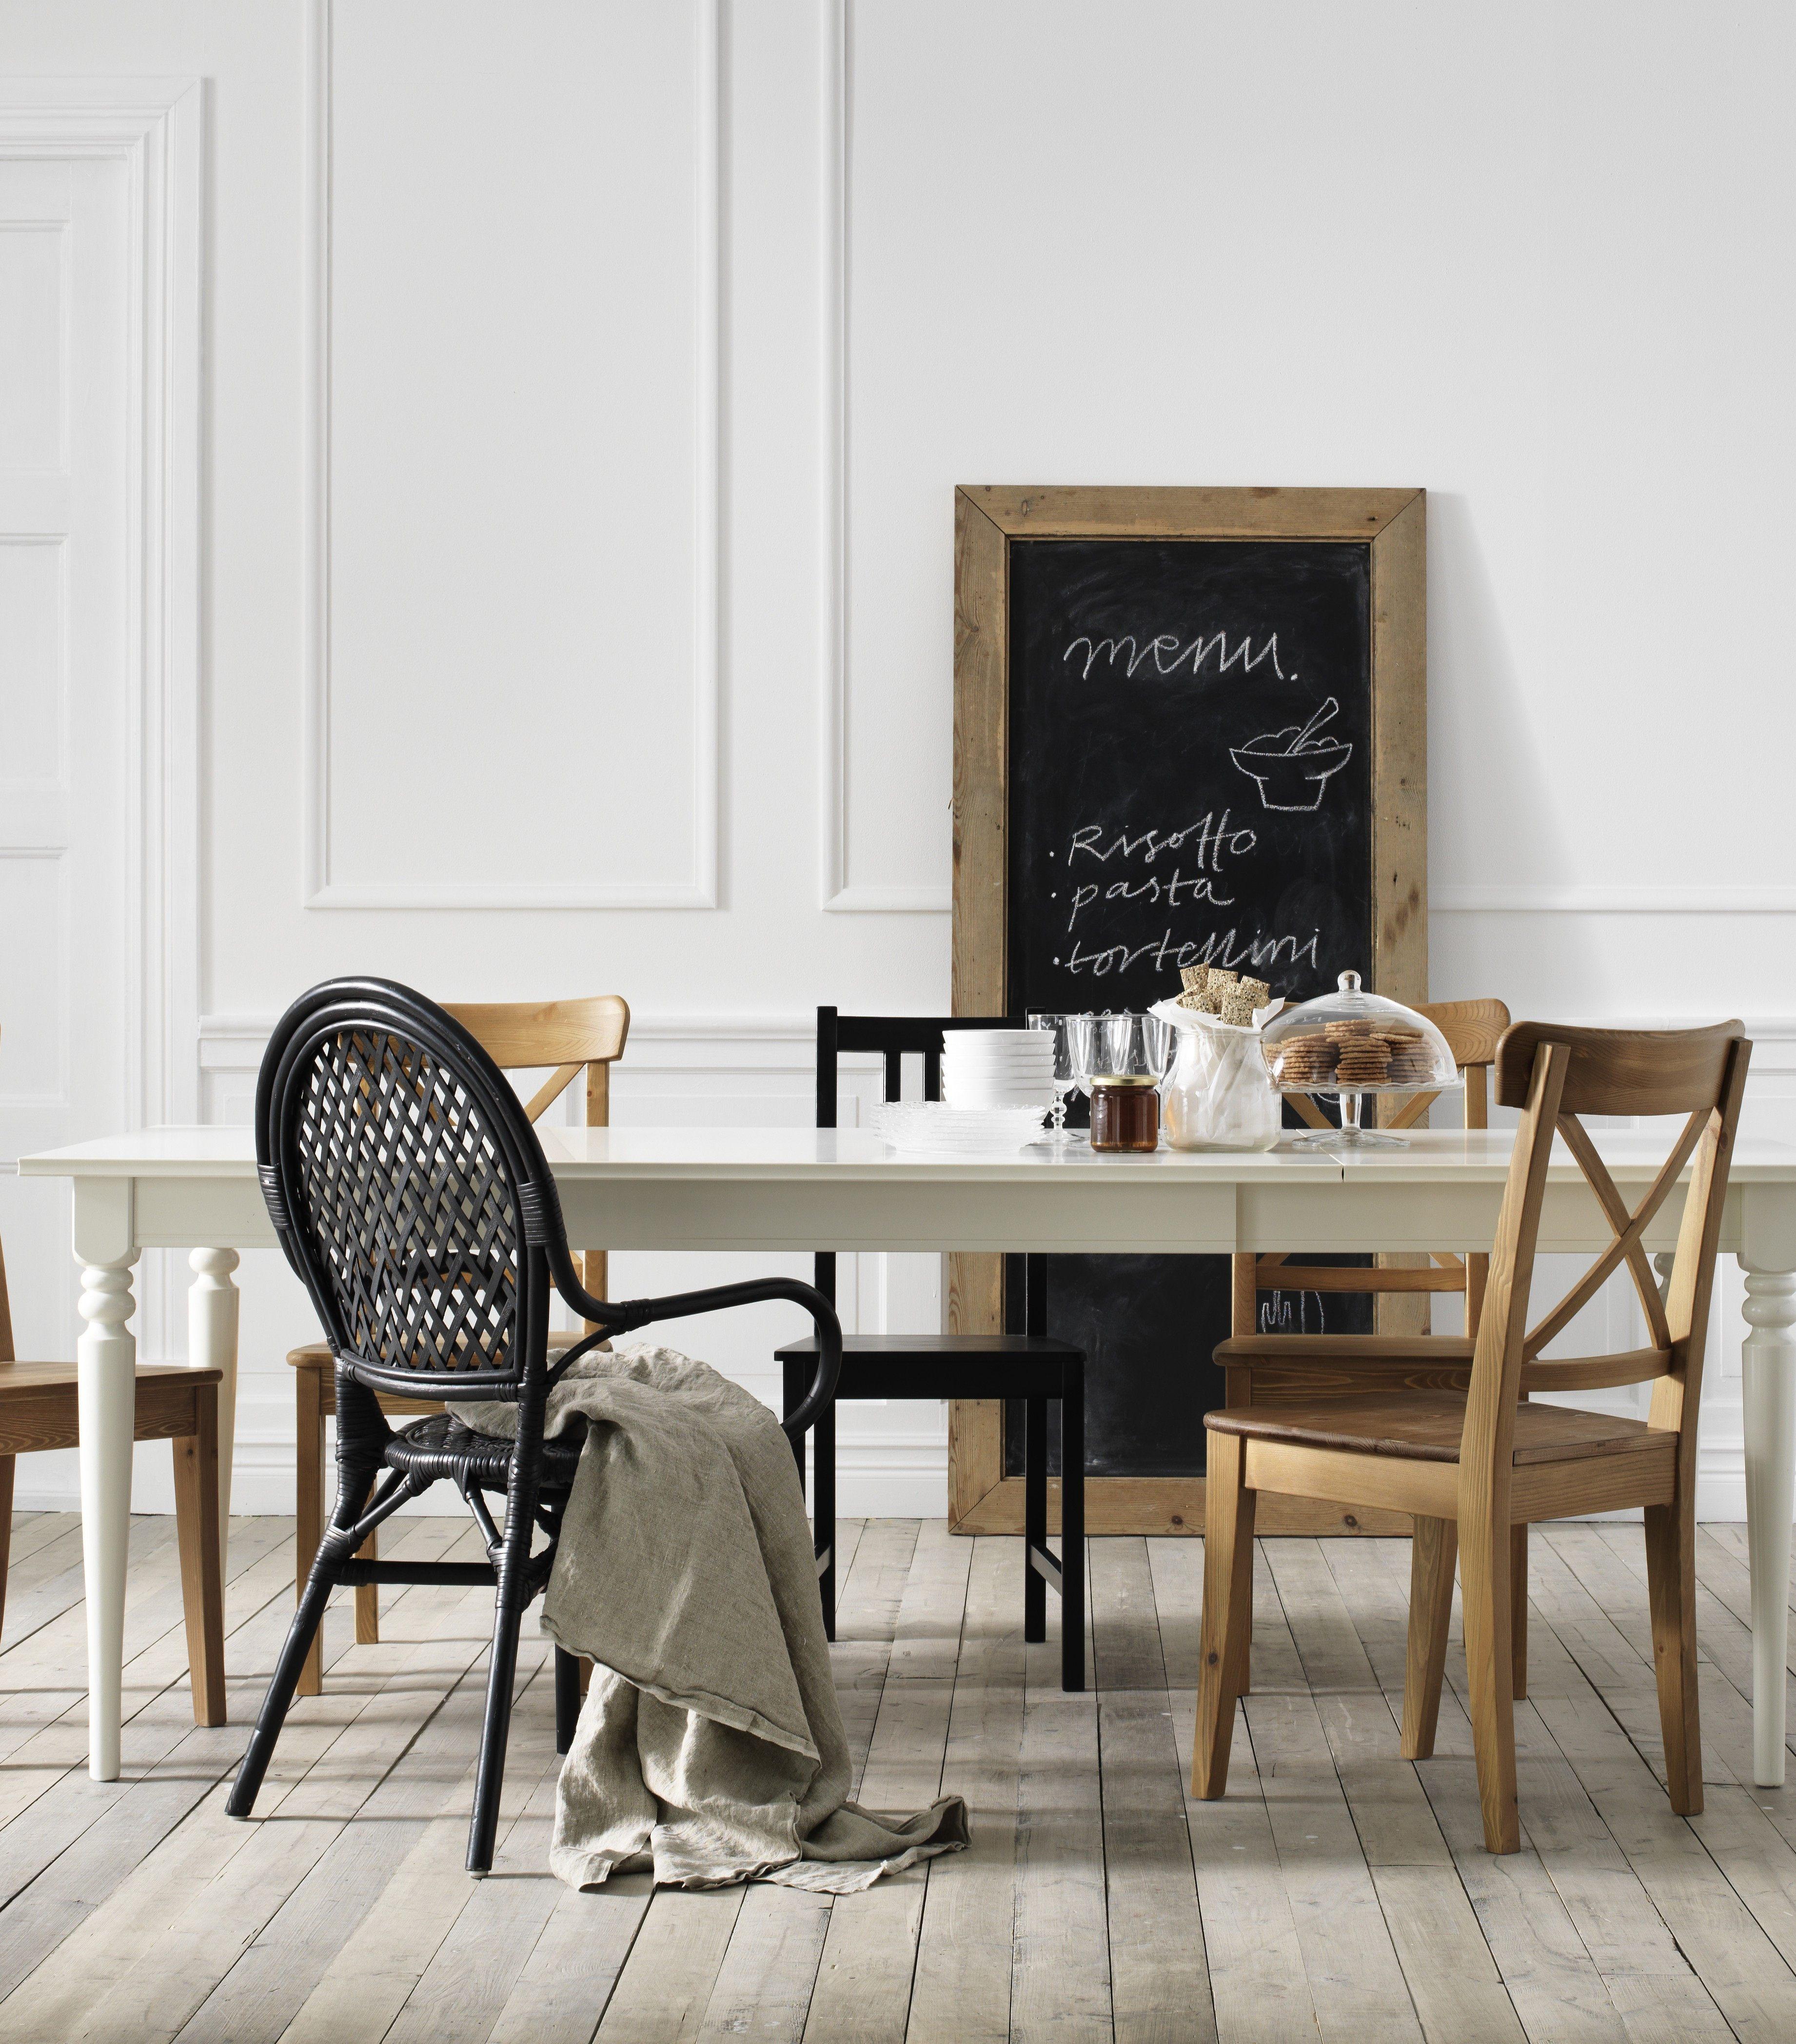 Lit Pliable Ikea De Luxe Remarquable Table Salle A Manger Ikea Et Interesting Metal Dining